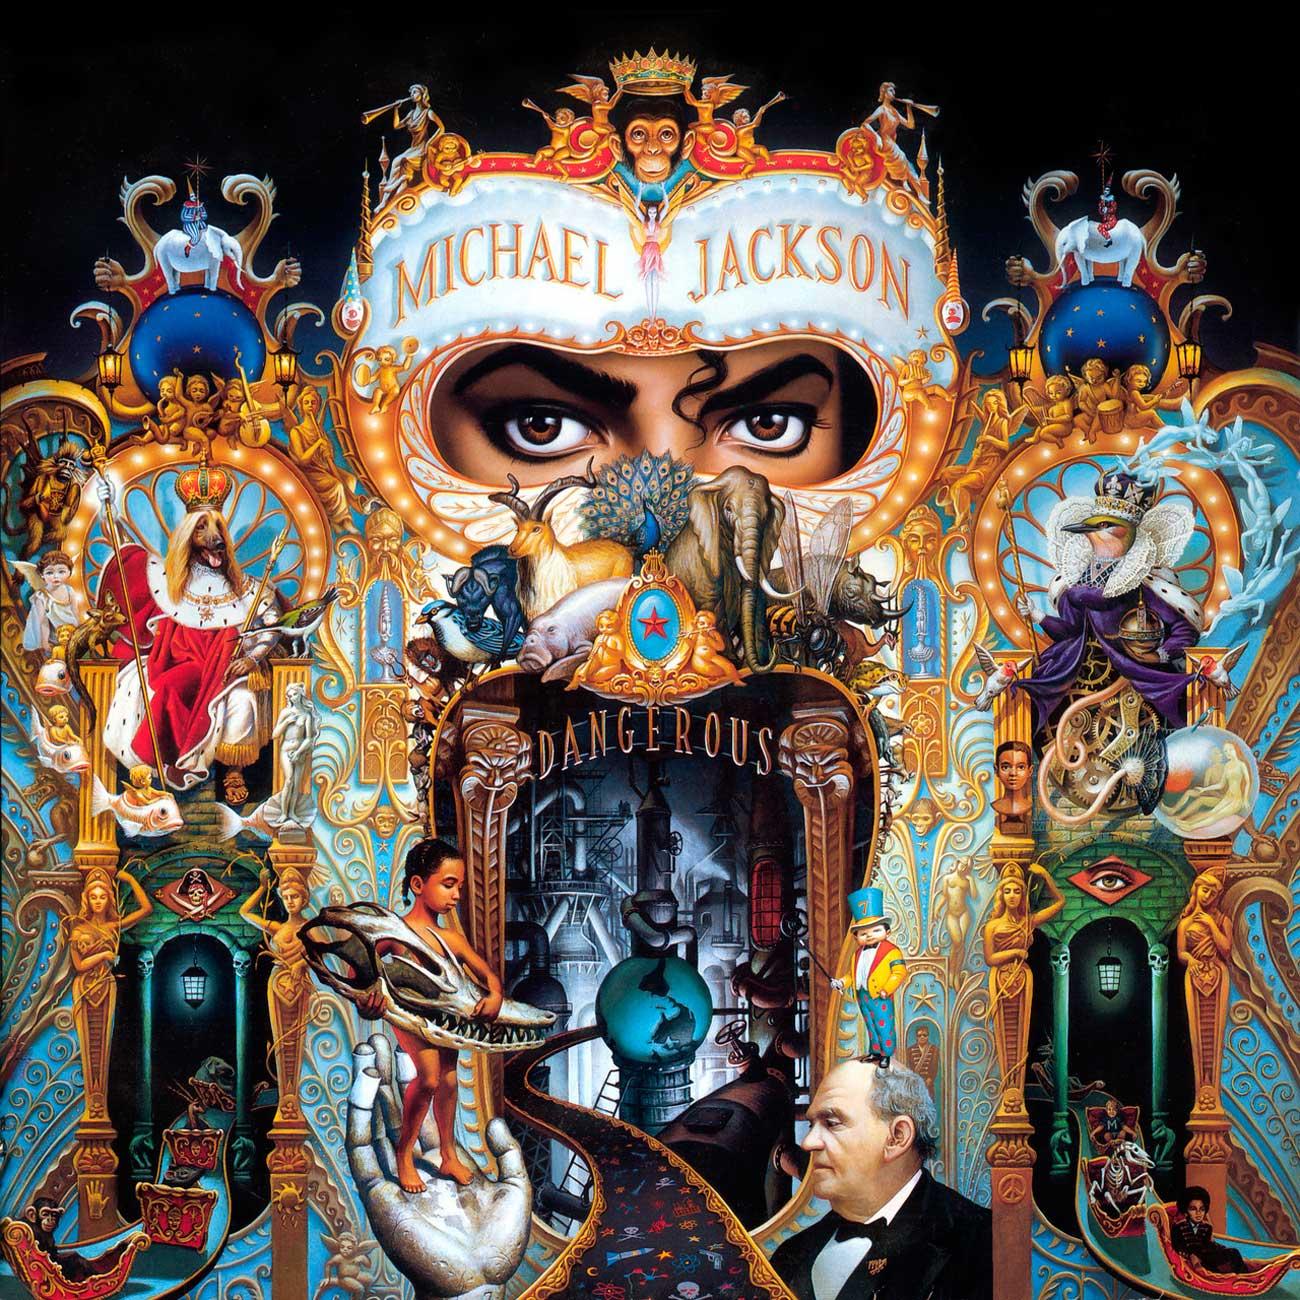 Обложка альбома Dangerous (Epic Records, 1991) Майкла Джексона